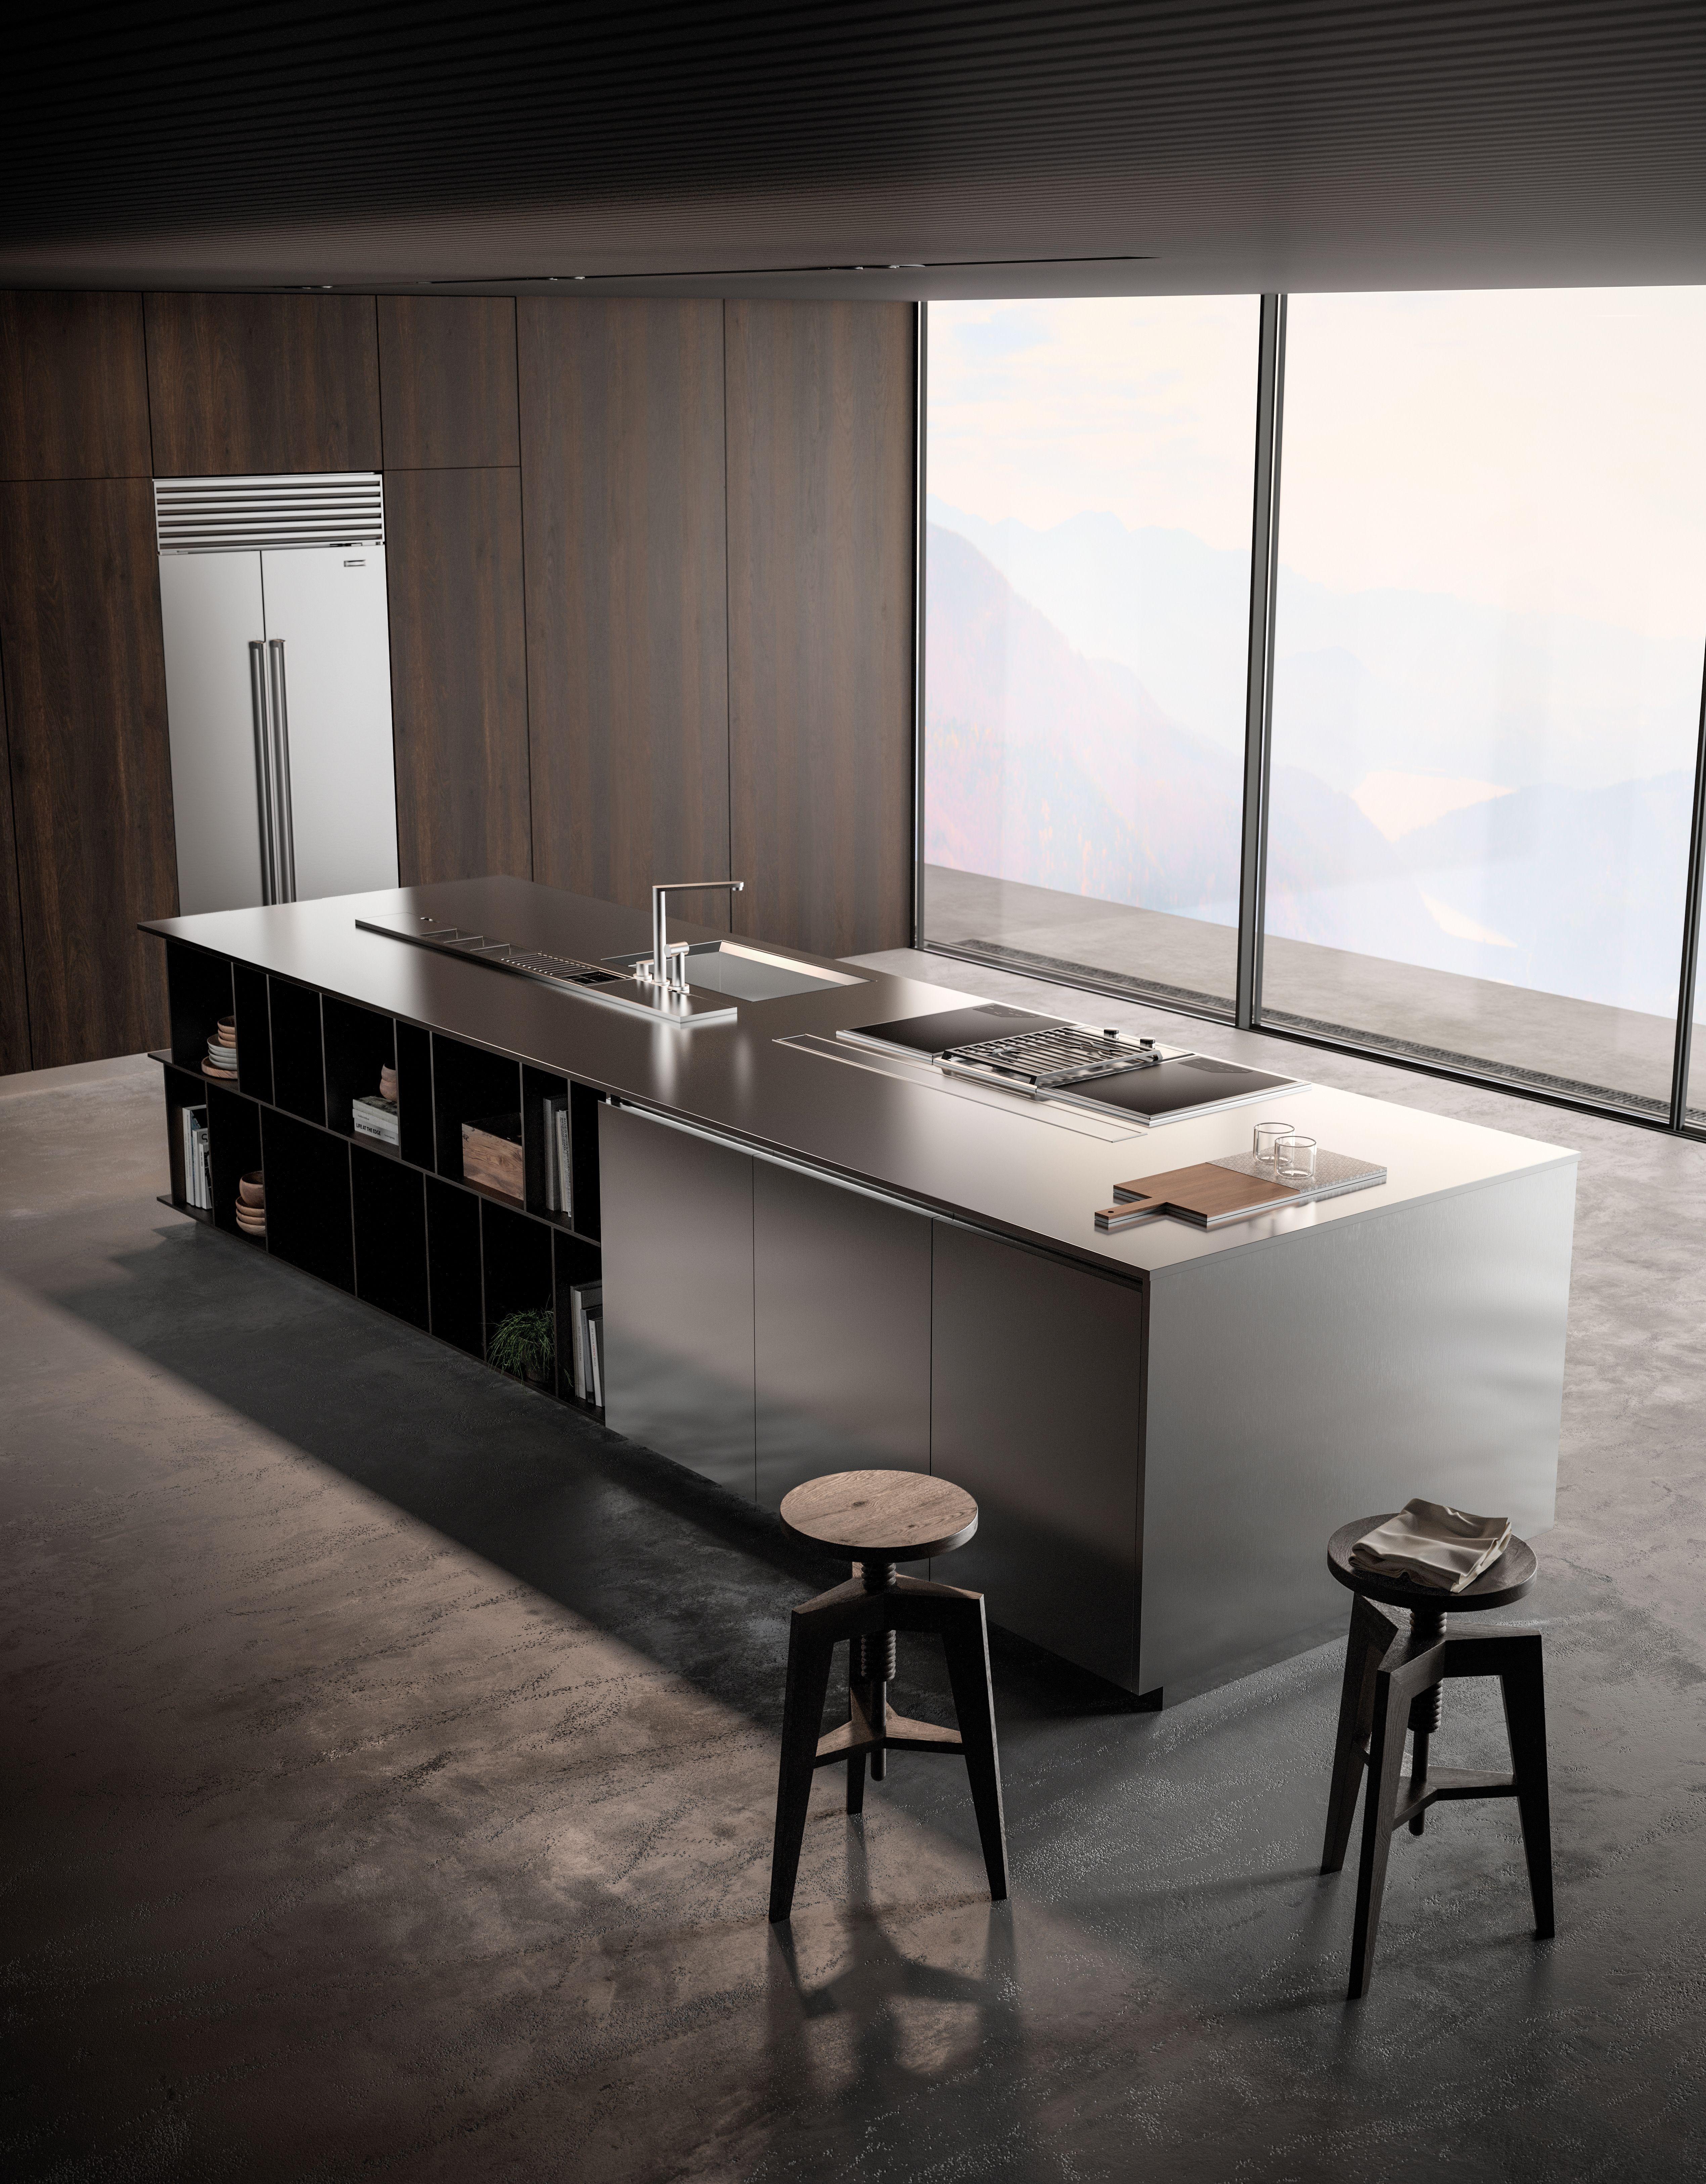 pin by ting yu on in 2018 pinterest kitchen interior rh pinterest com